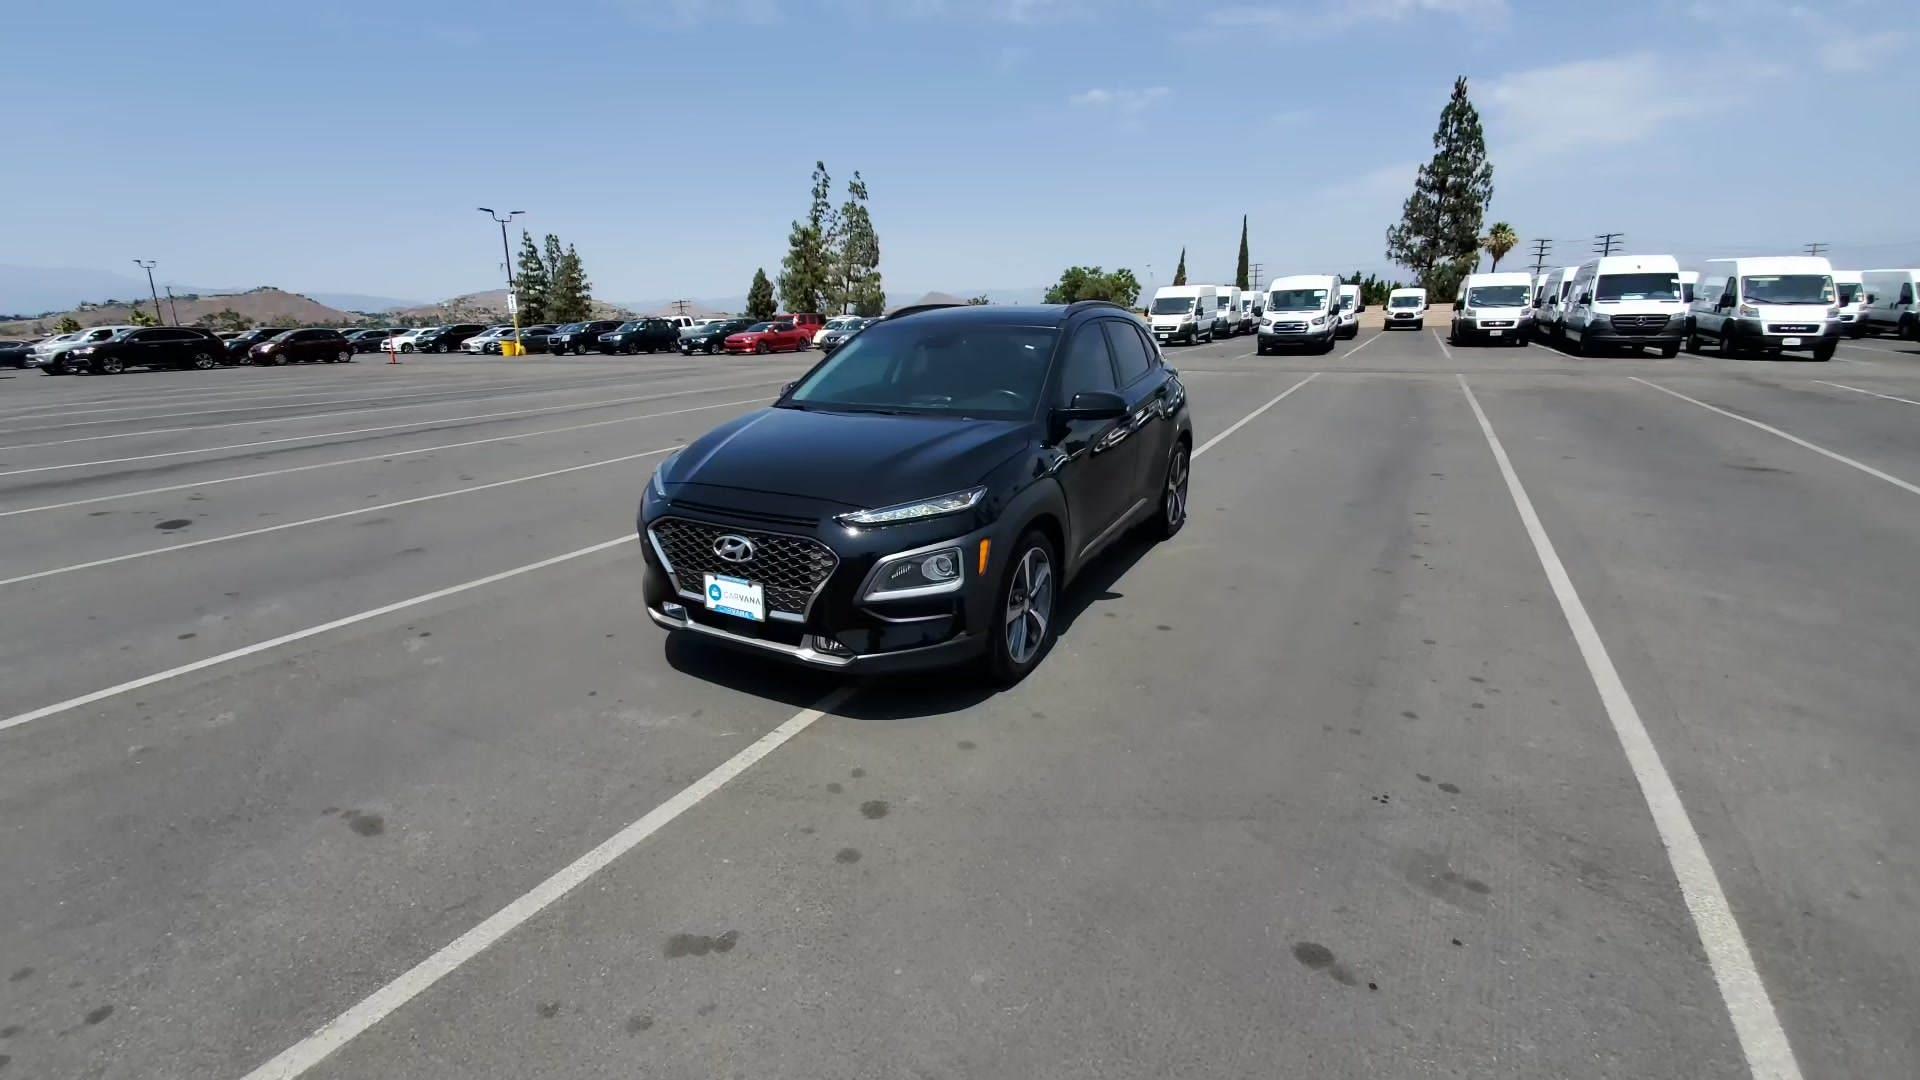 2019 Hyundai Kona Hayward CA